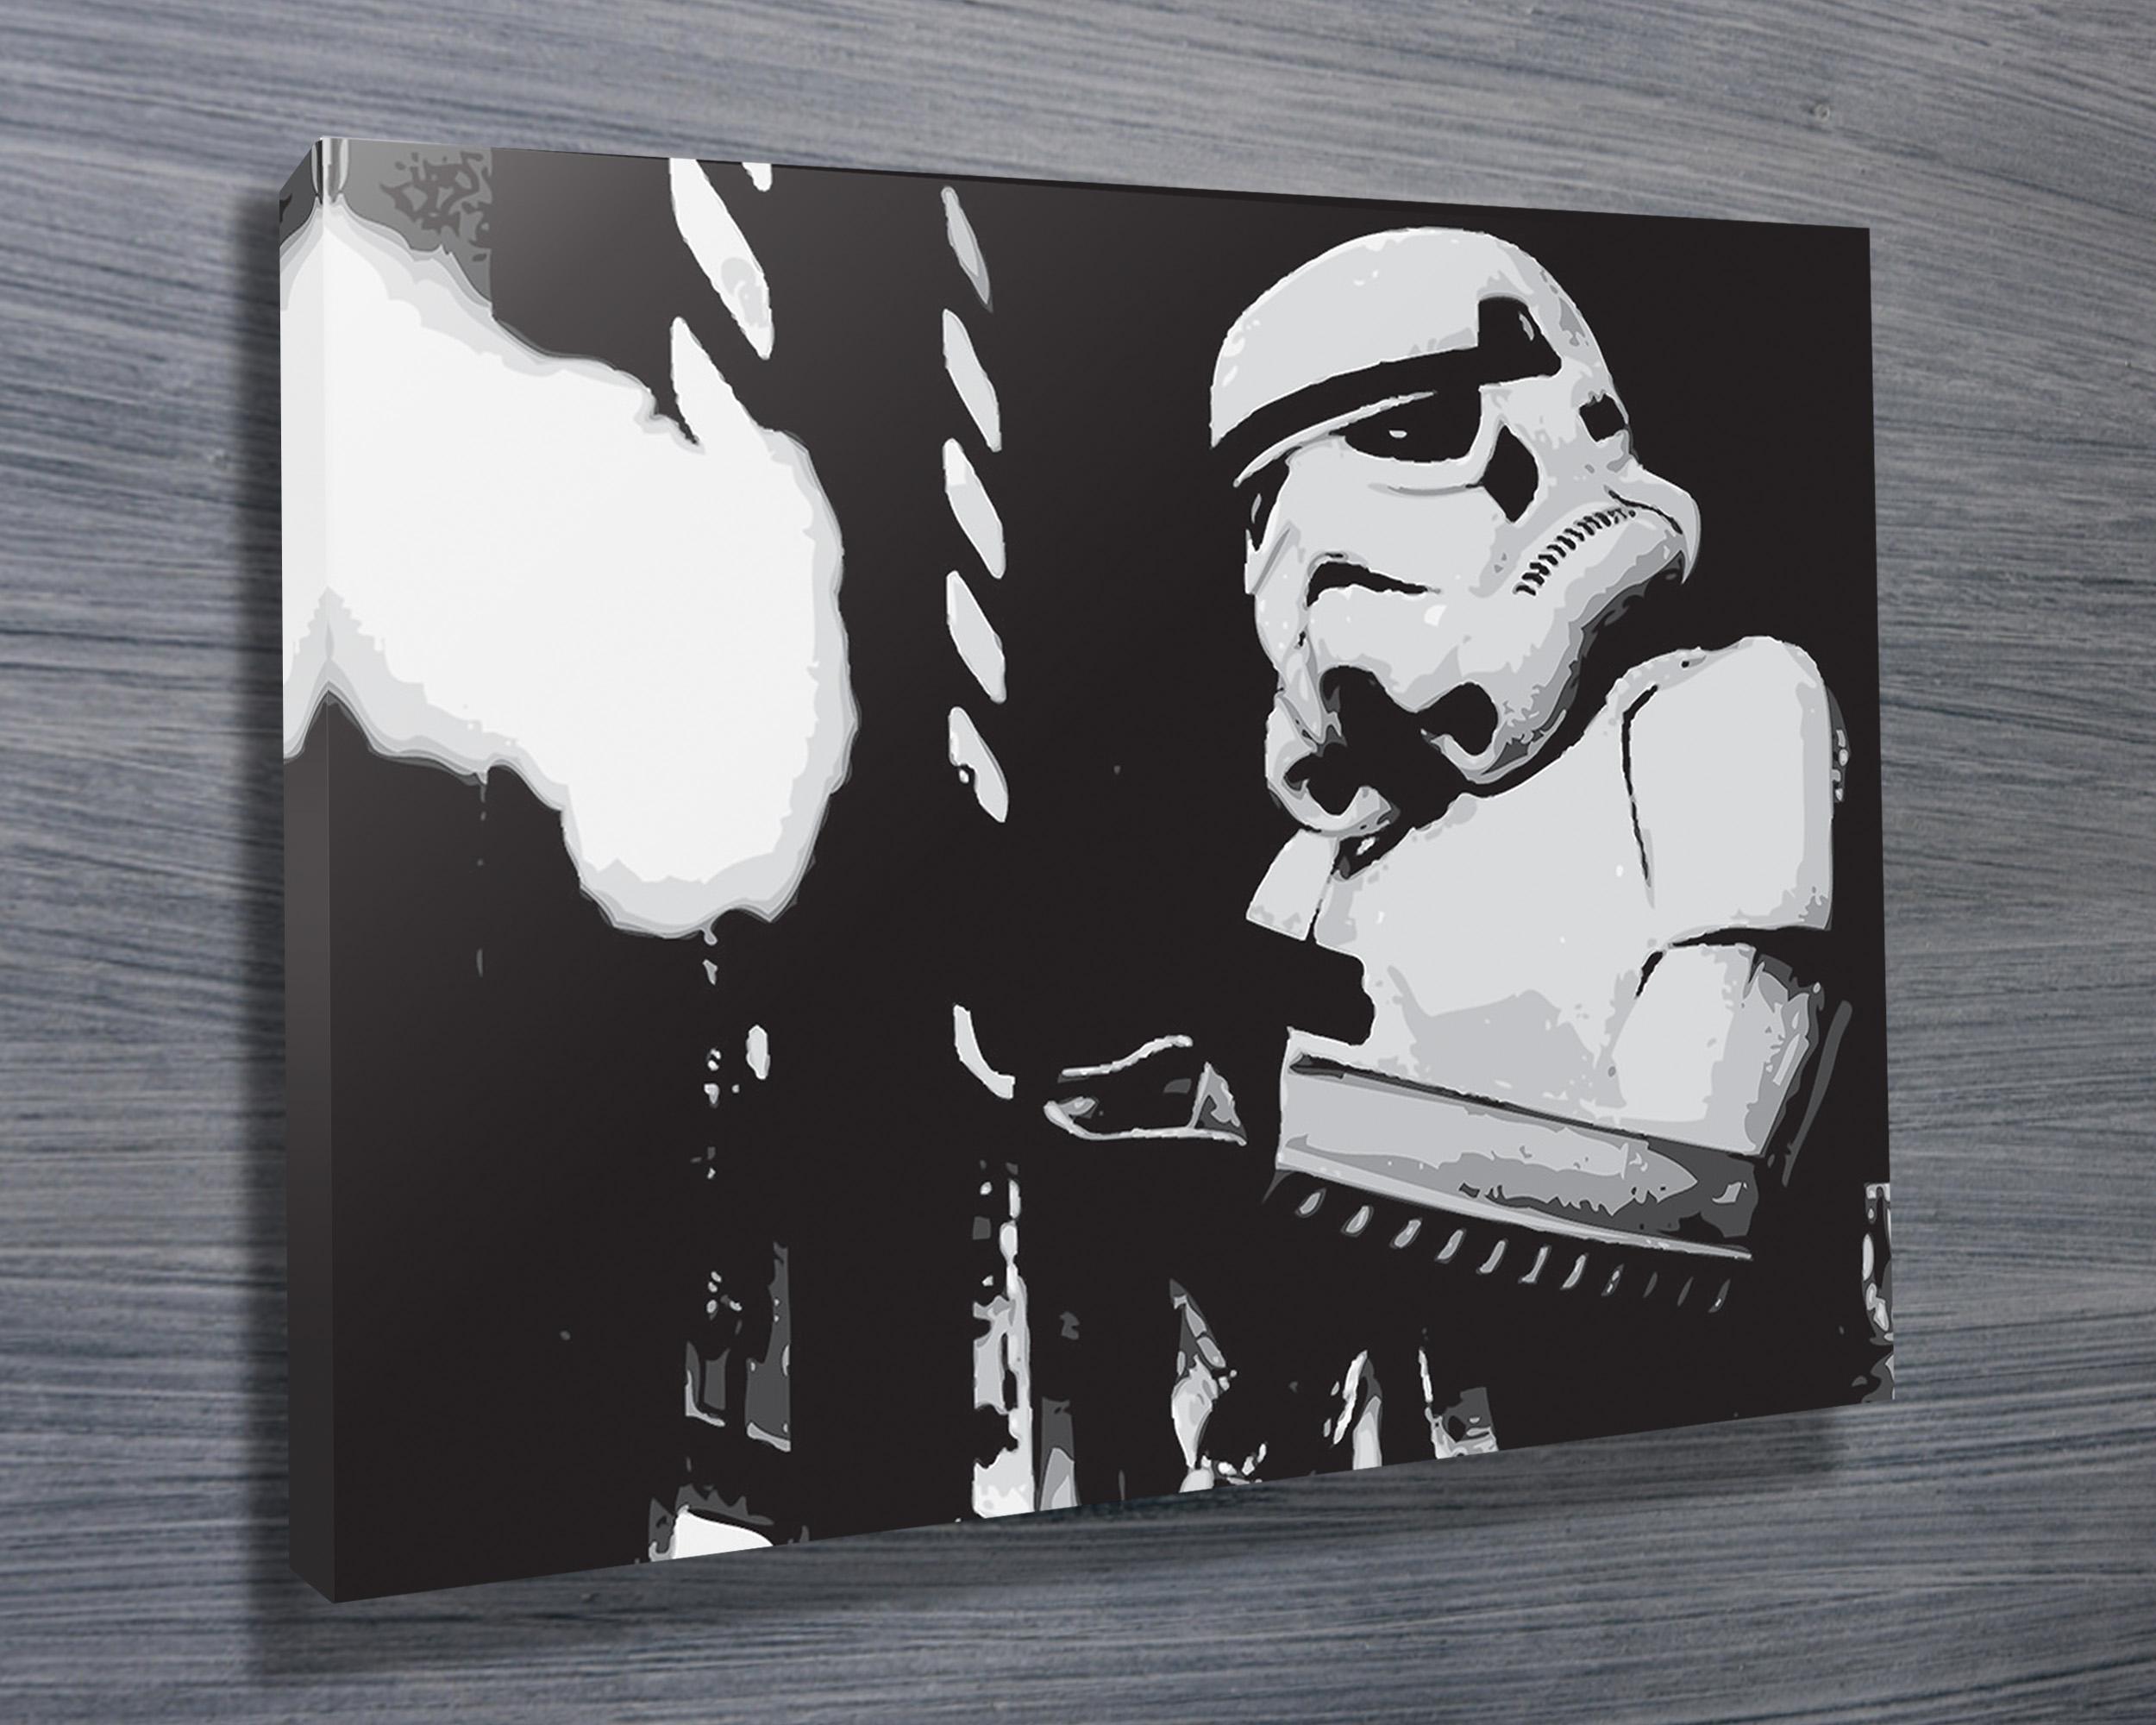 Stormtrooper Ii Art Canvas Prints Australia